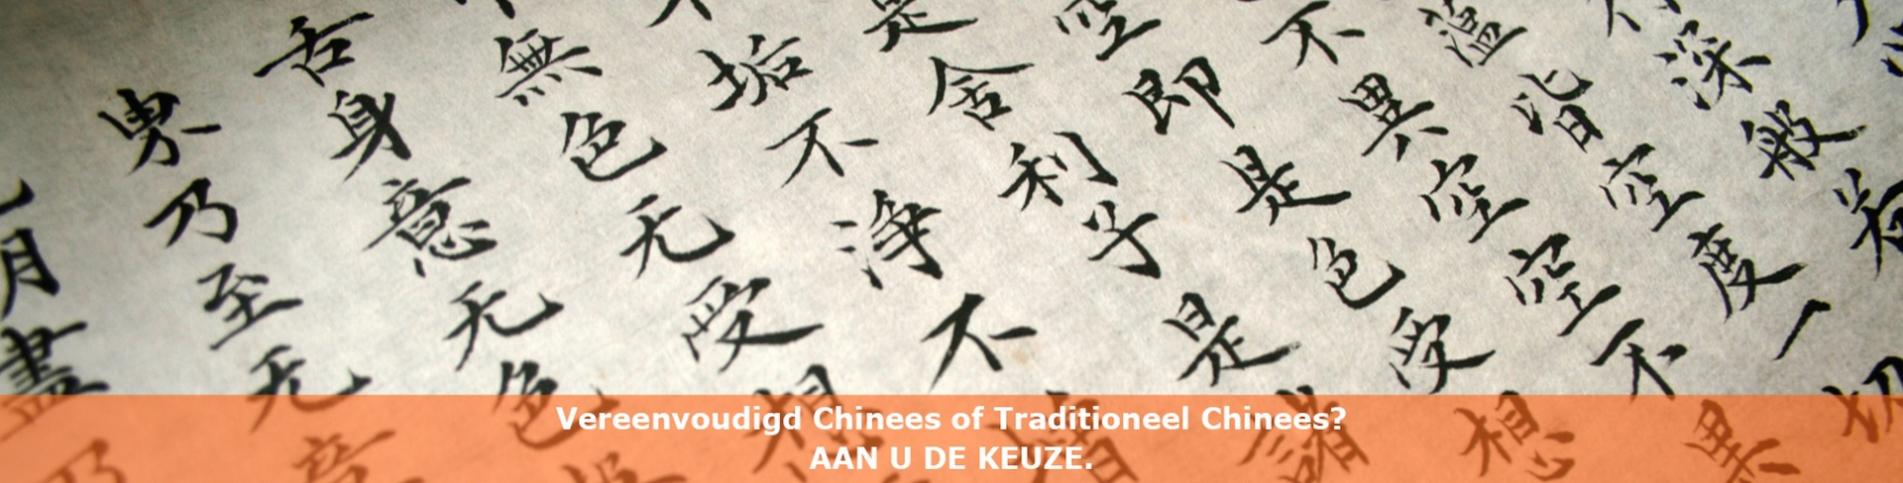 Vereenvoudigd of traditioneel Chinees ?